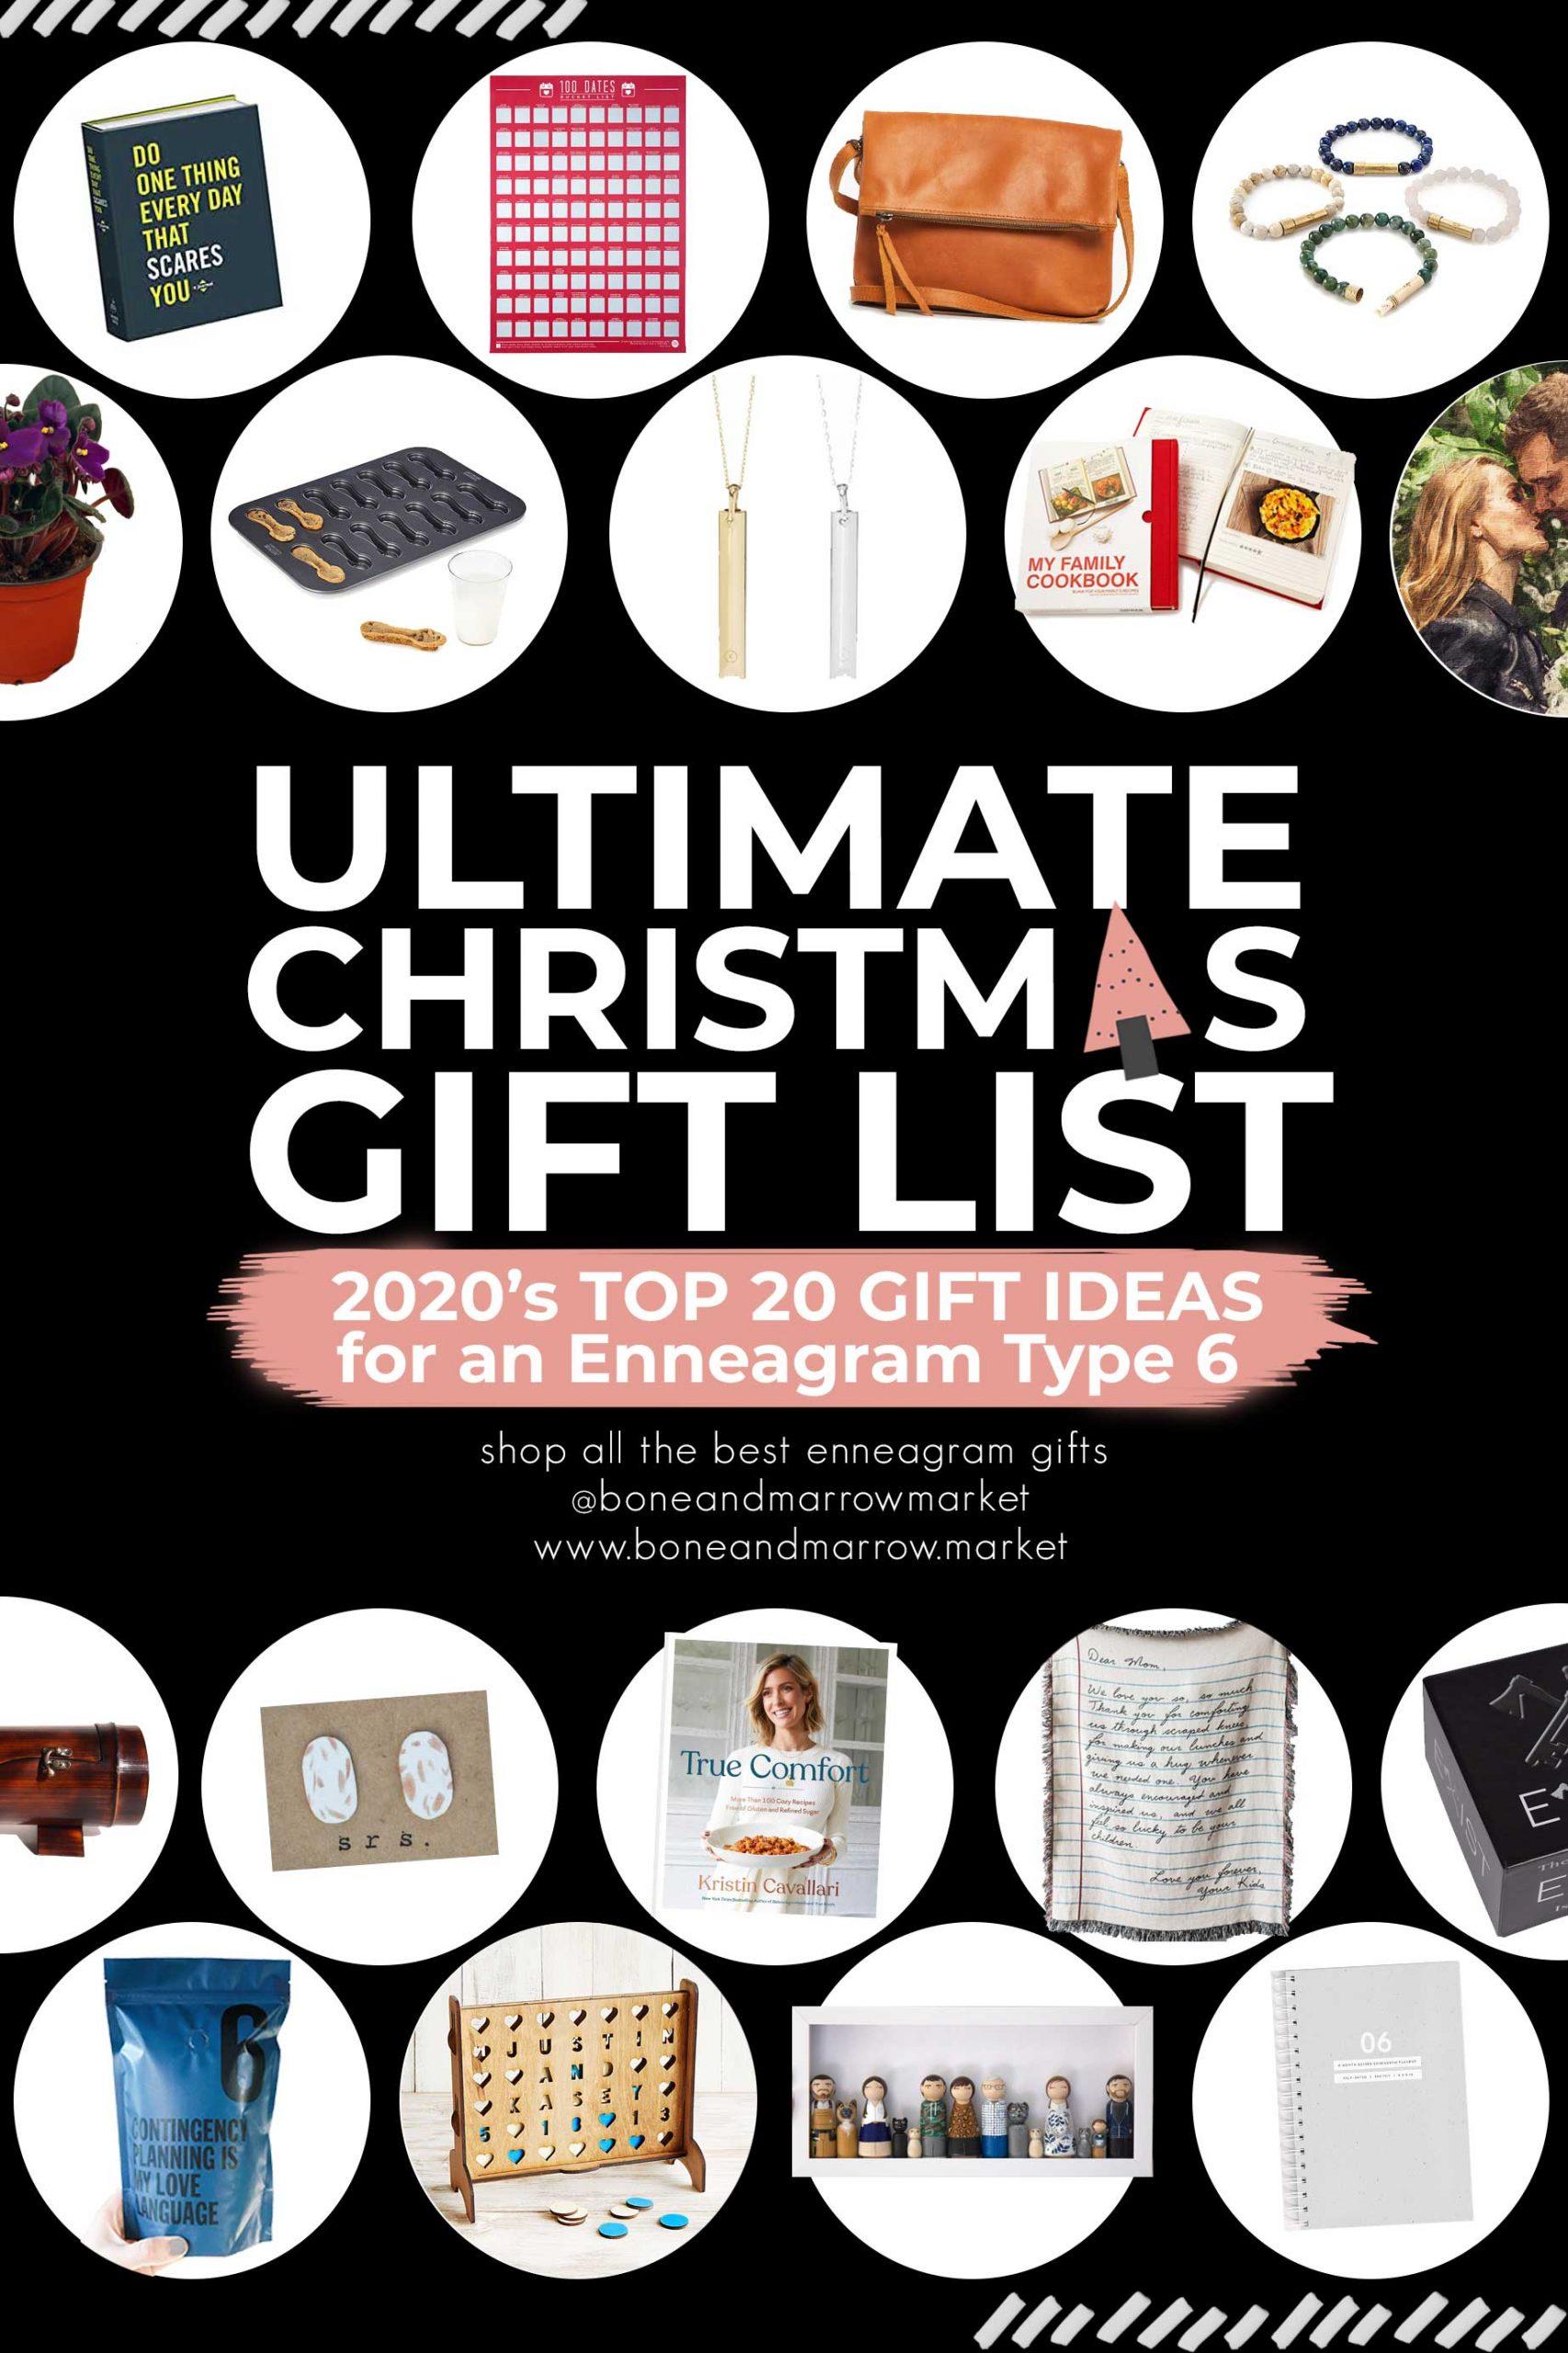 Ultimate Christmas Gift Ideas for an Enneagram 6